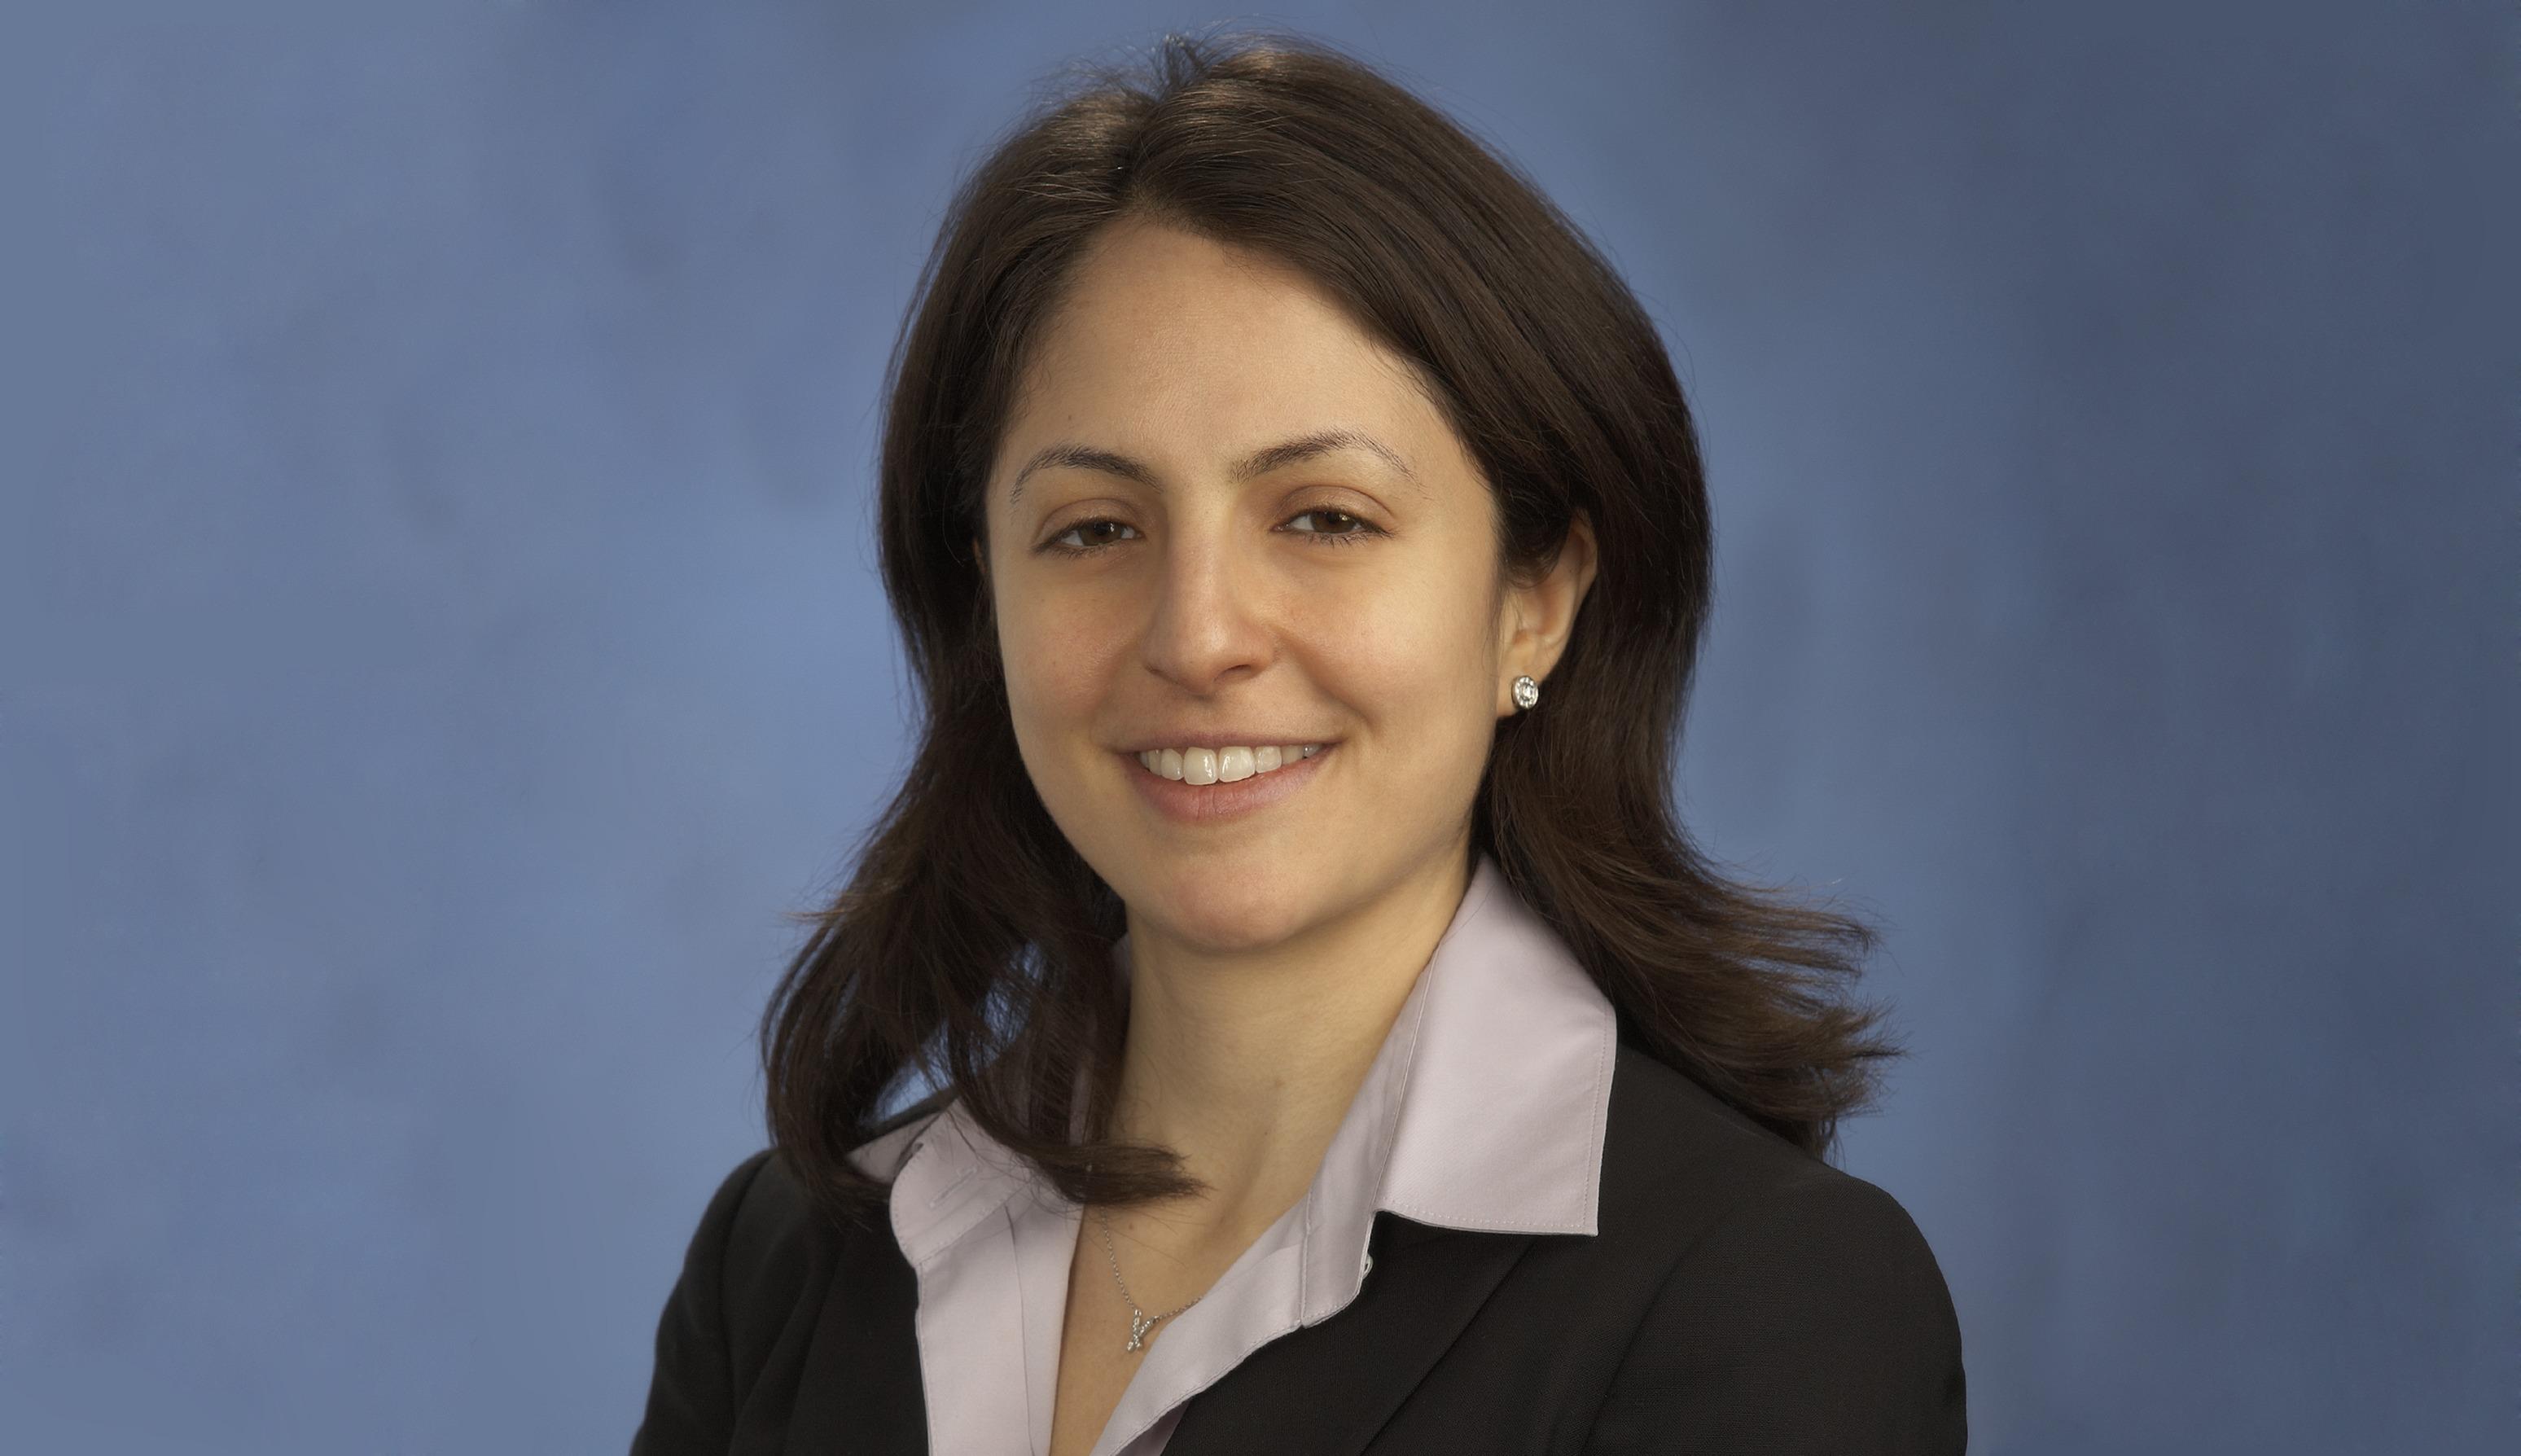 Cohen Stephanie